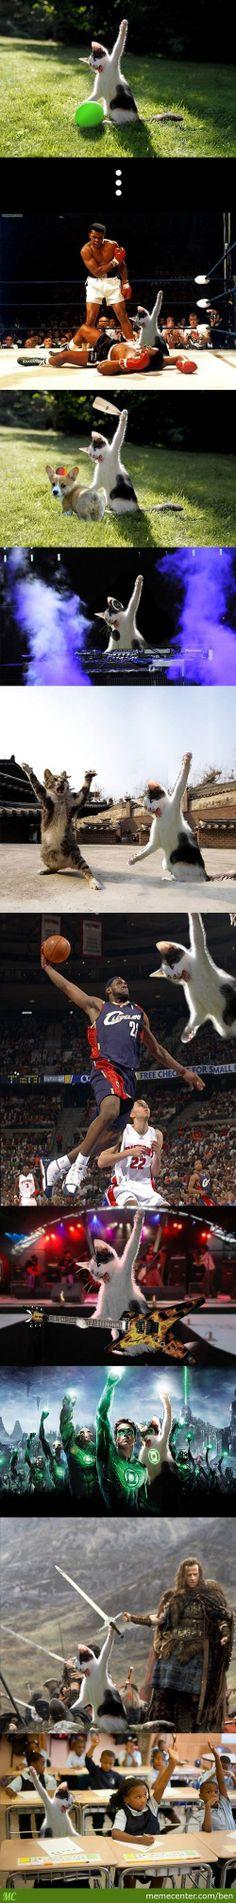 Un gato haciendo gatadas